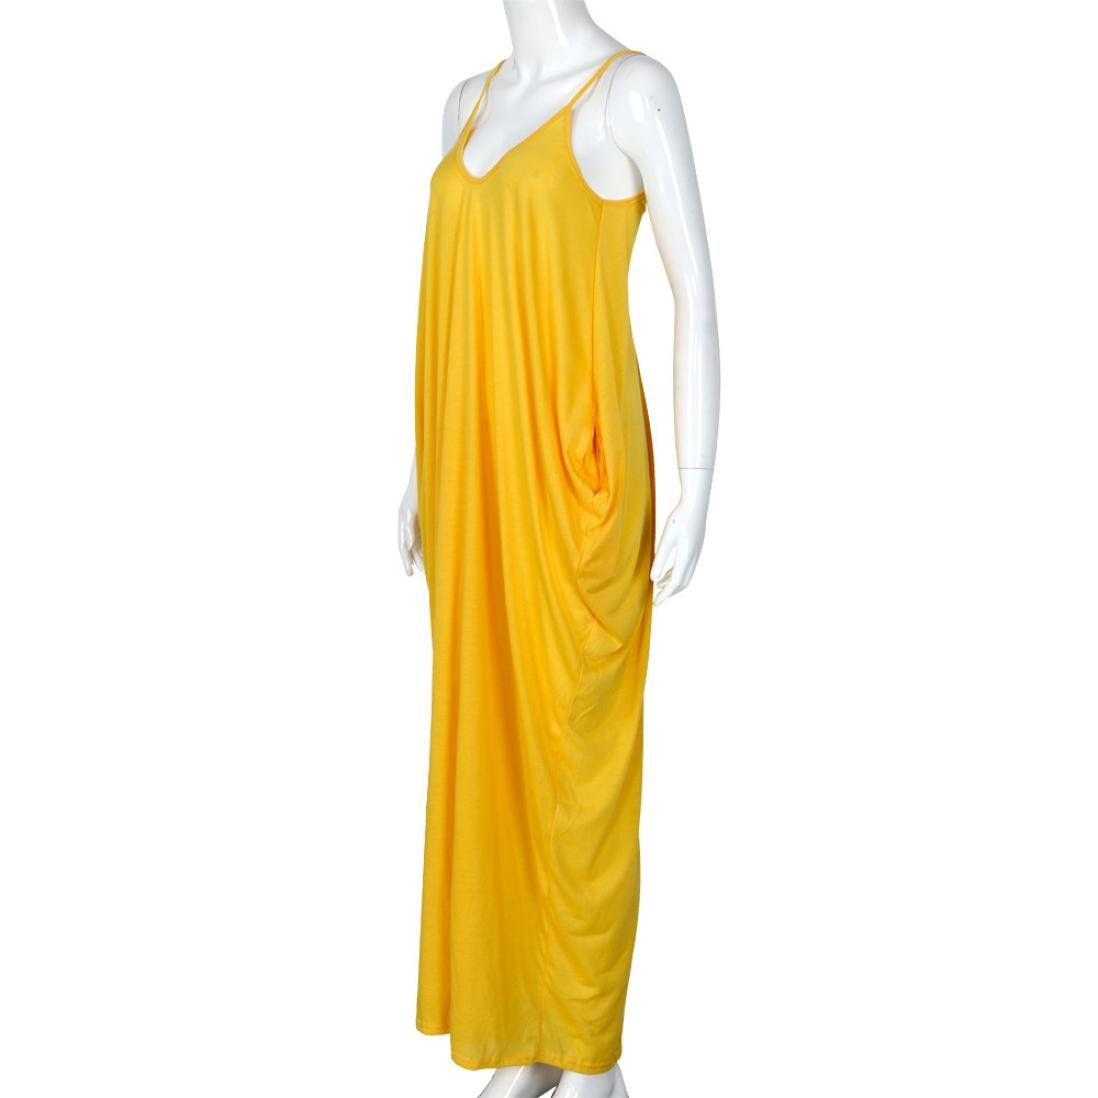 Exclusive Fashion Maxi Evening Party Dress Beach Dresses Ninasill Beautiful Irregular Gallus Women Summer Boho Long Dress